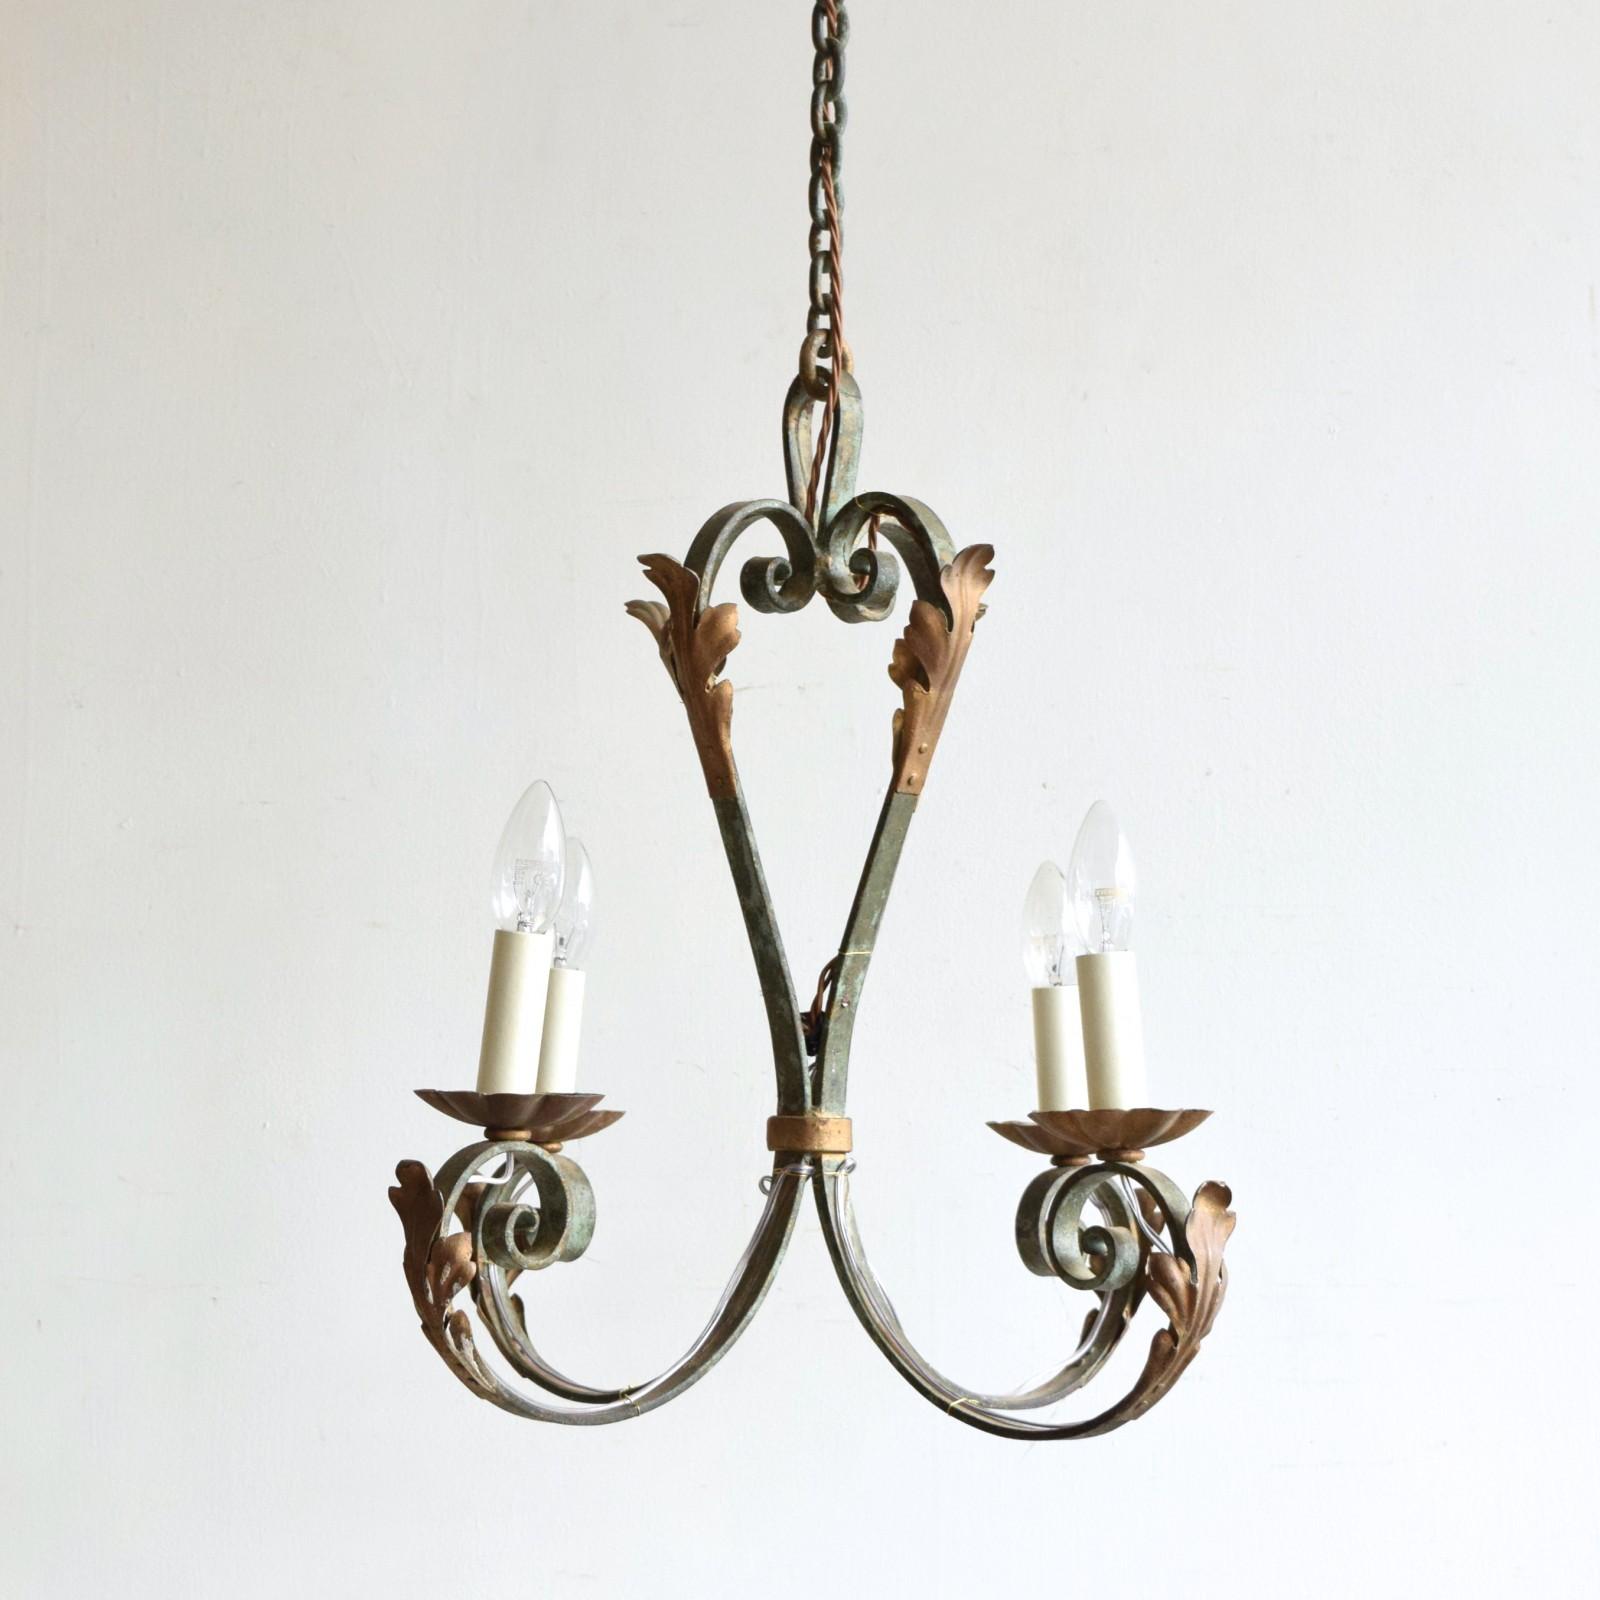 greened wrought iron pendant. Black Bedroom Furniture Sets. Home Design Ideas